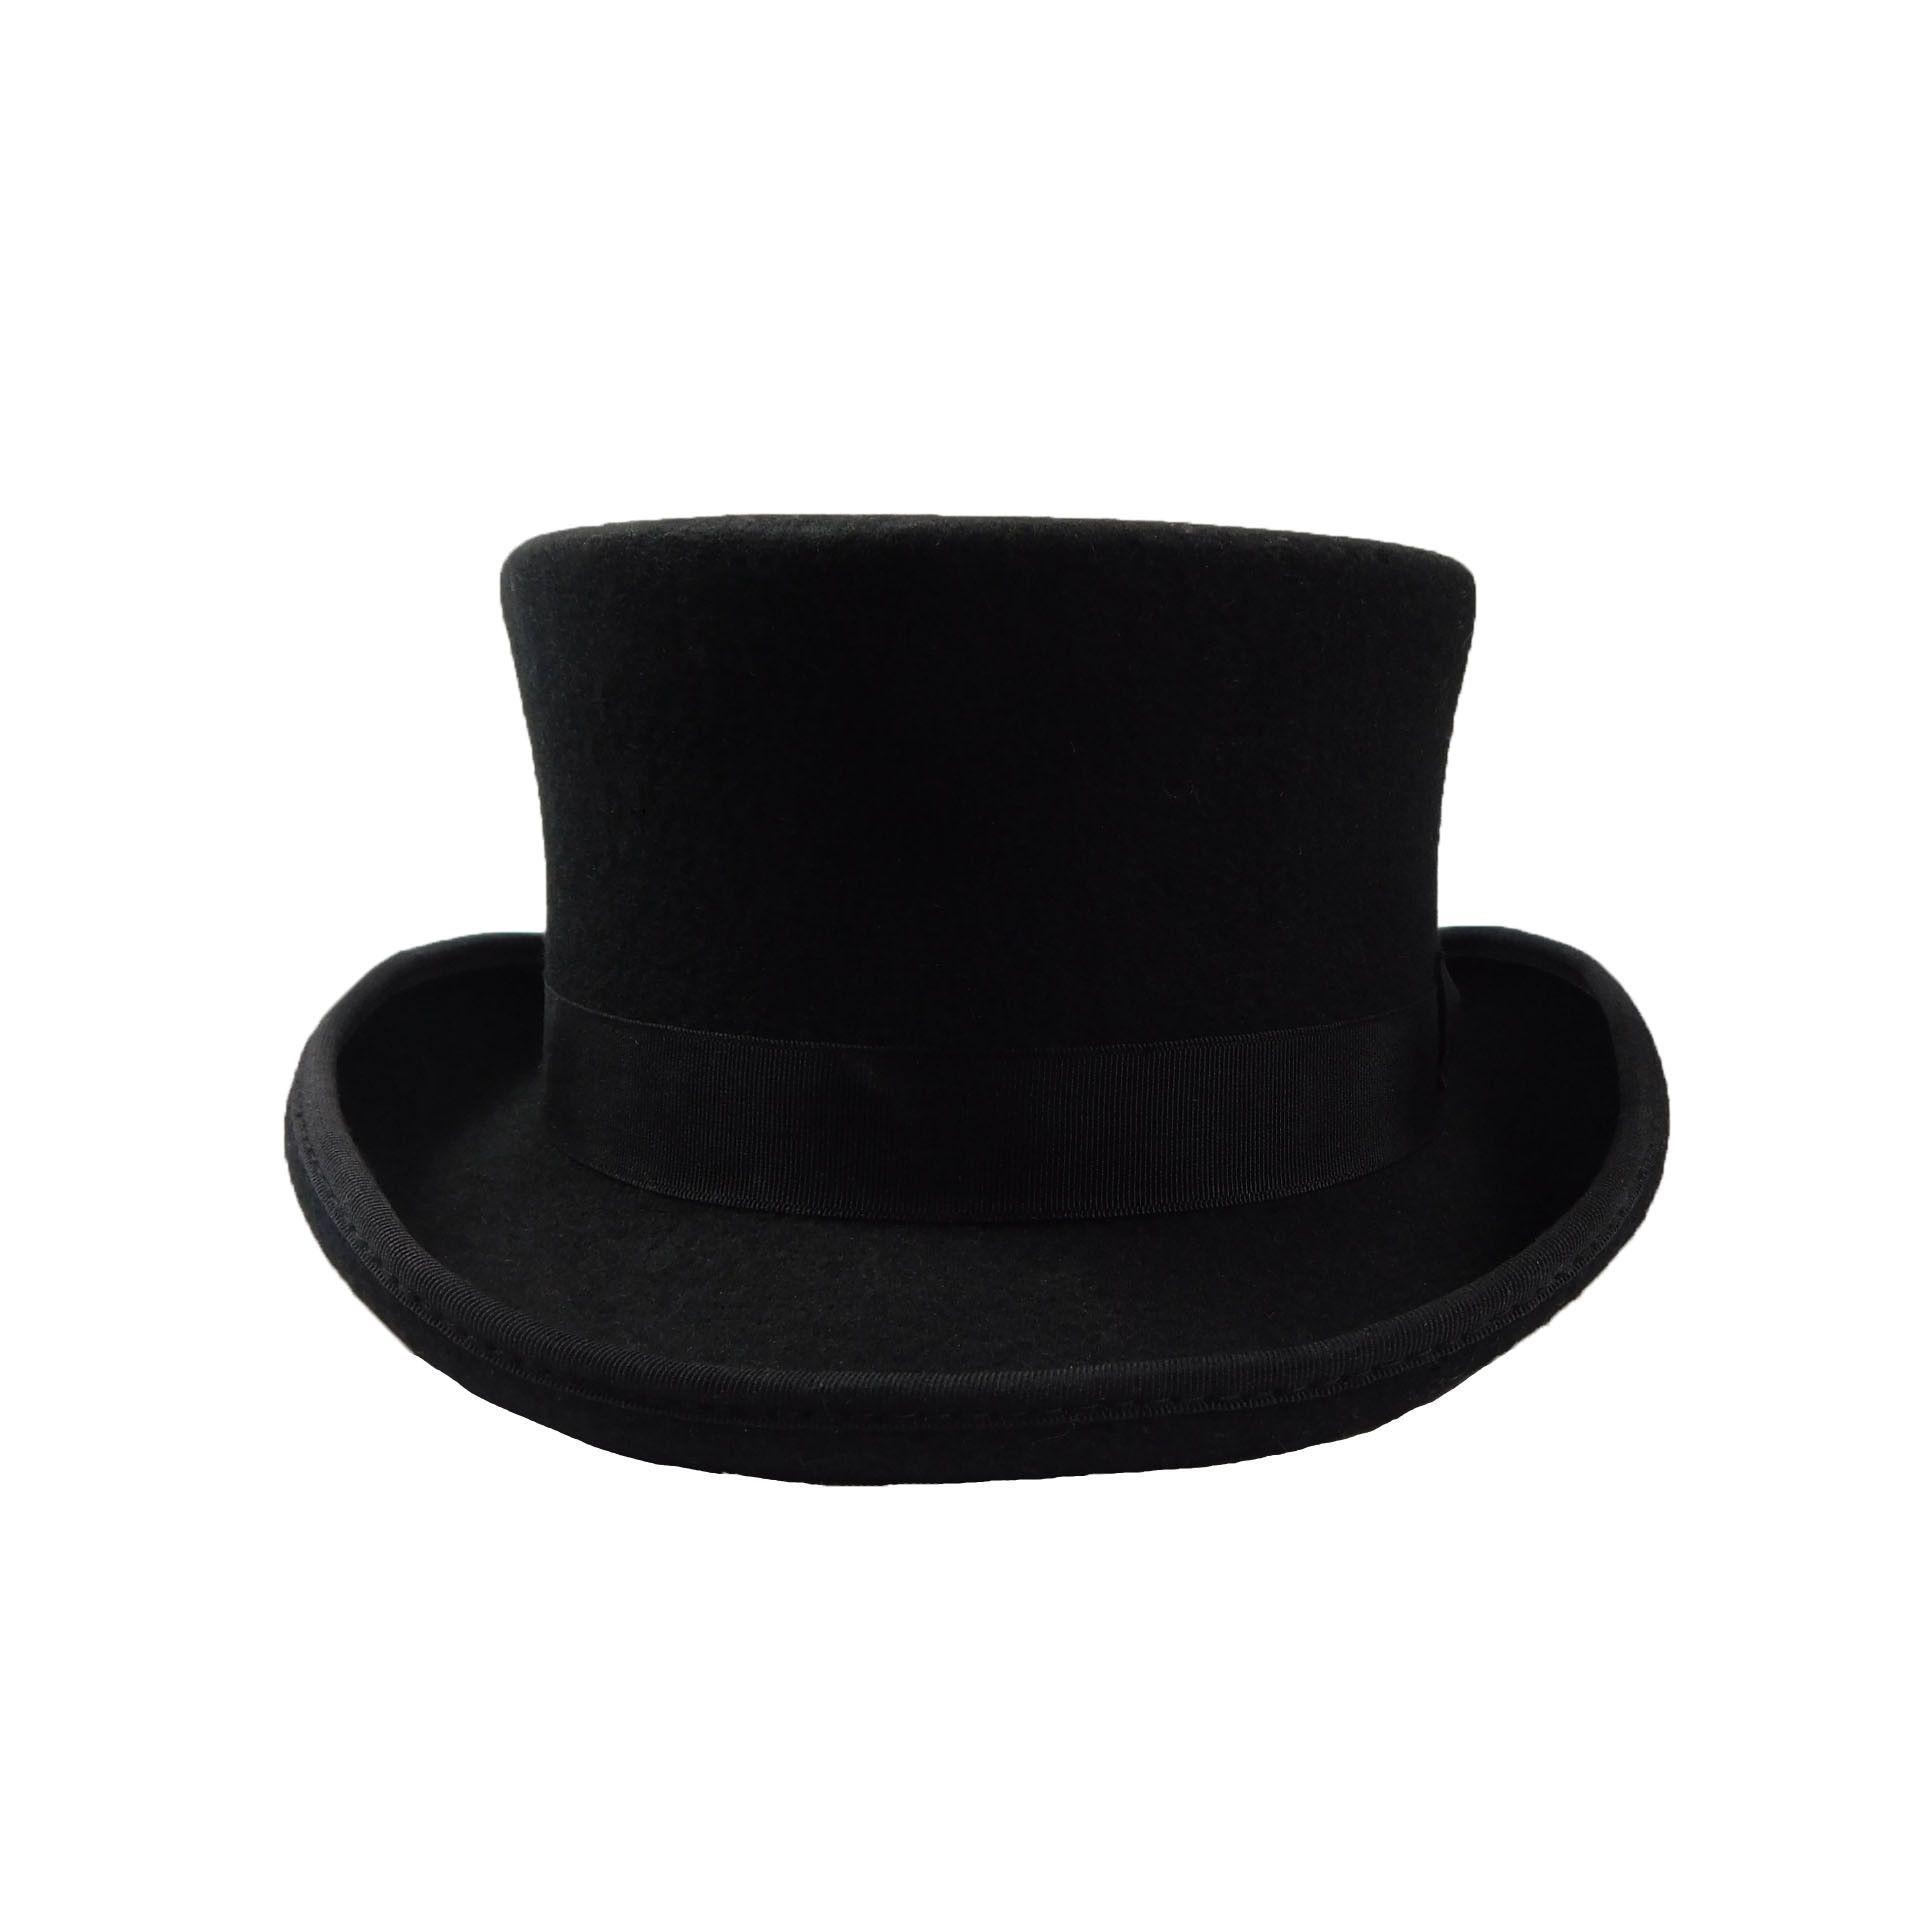 Classic Short Brown Wool Felt Top Hat By Jsa For Men Steampunk Diy